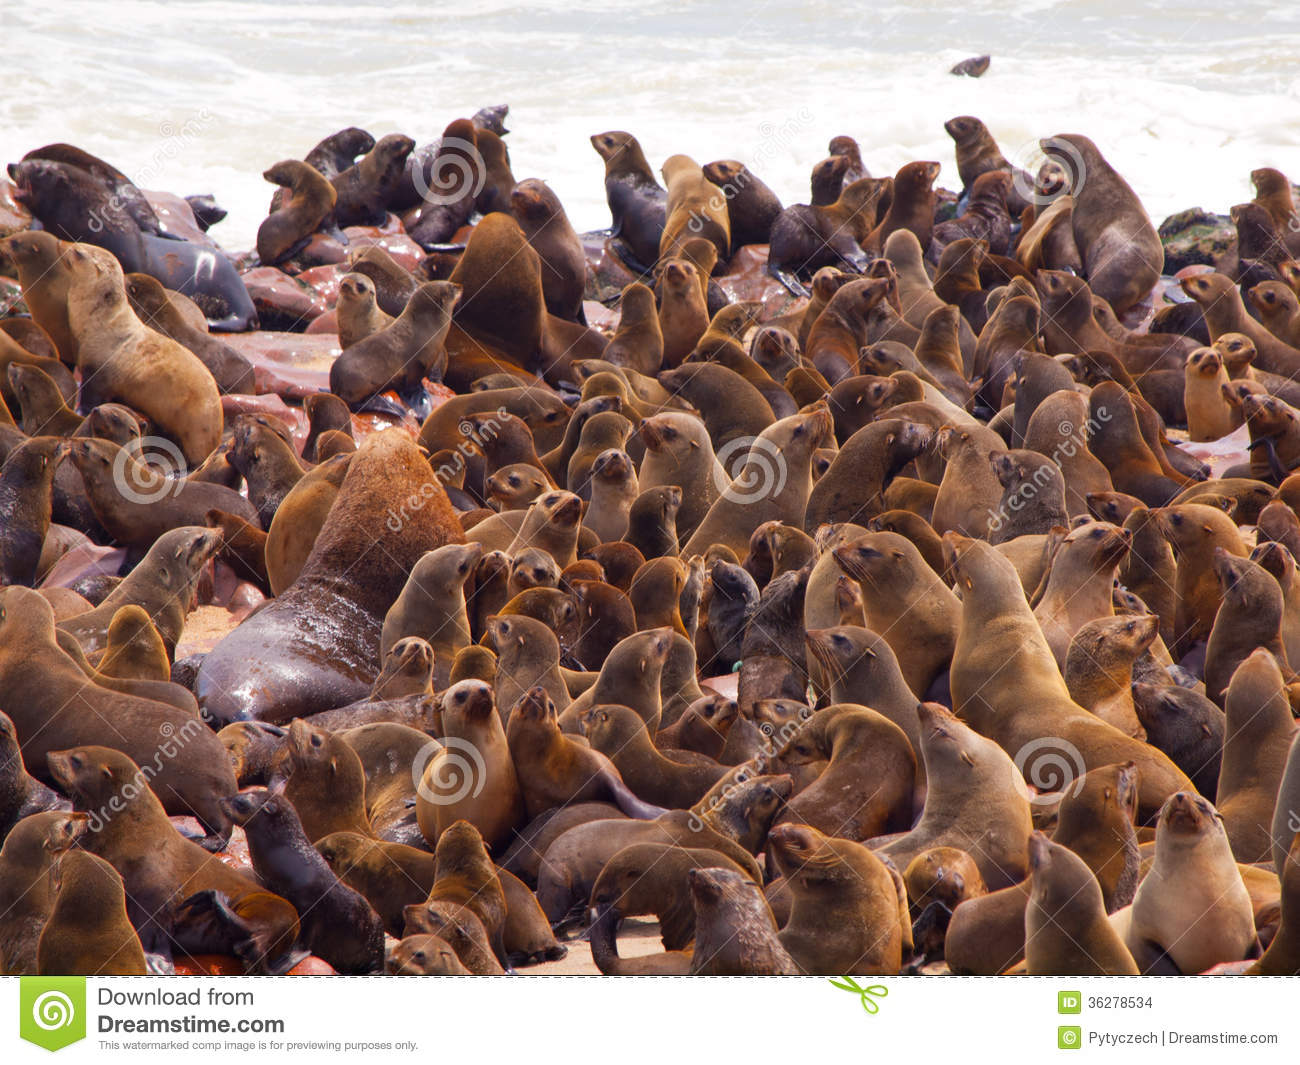 Brown Fur Seal Colony (Arctocephalus Pusillus) Stock Images.